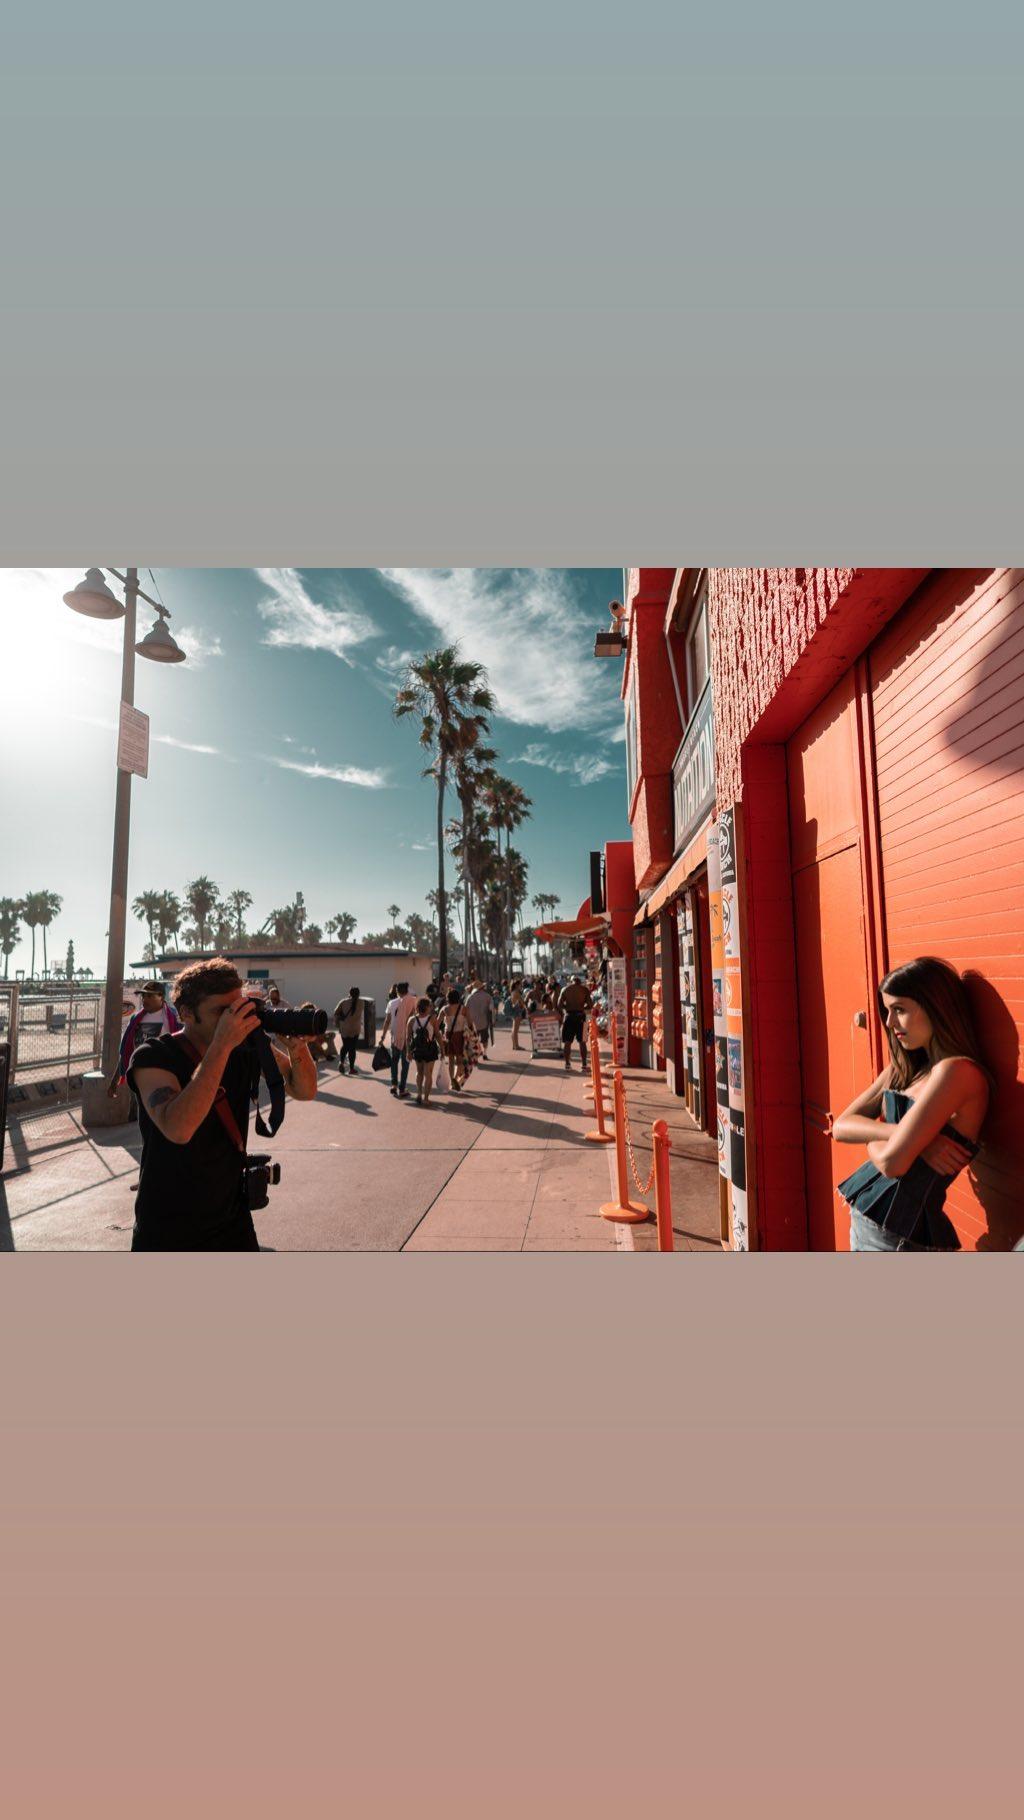 Demy: Ο λόγος που ταξίδεψε στο Los Angeles και αυτό που τη συνέδεσε με την Beyonce! [pics,vid]